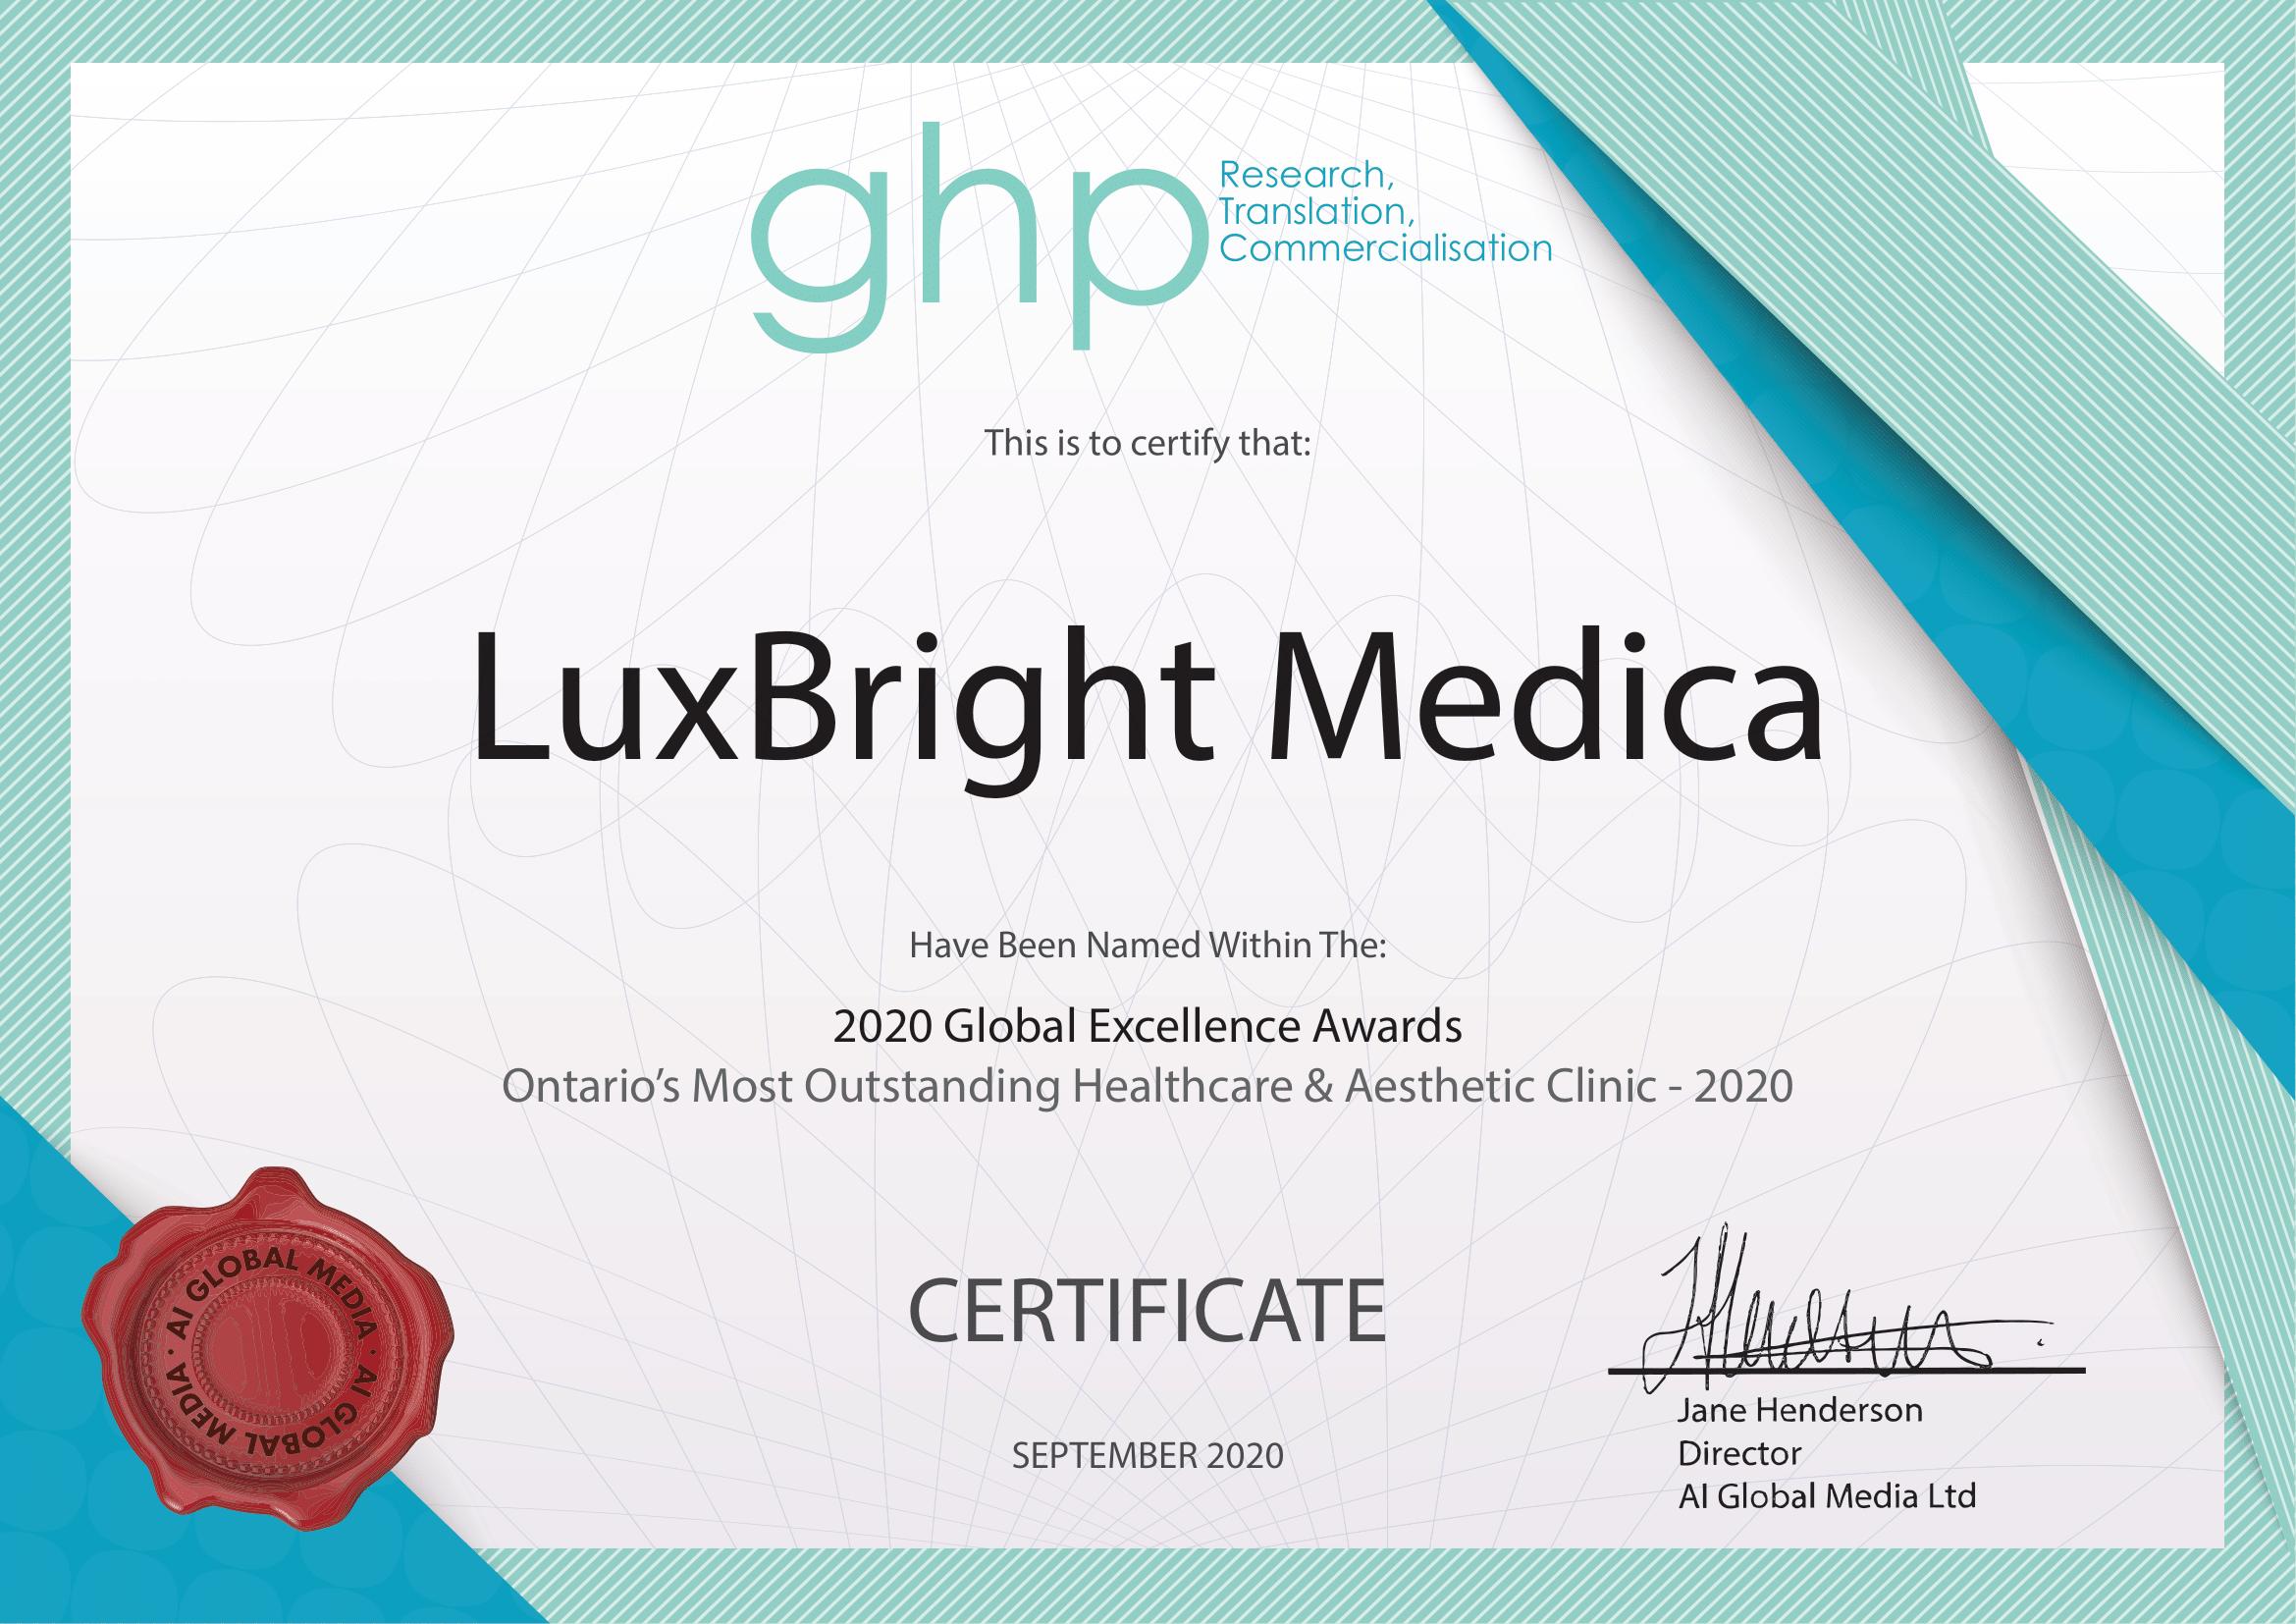 LuxBright Medica Certificate